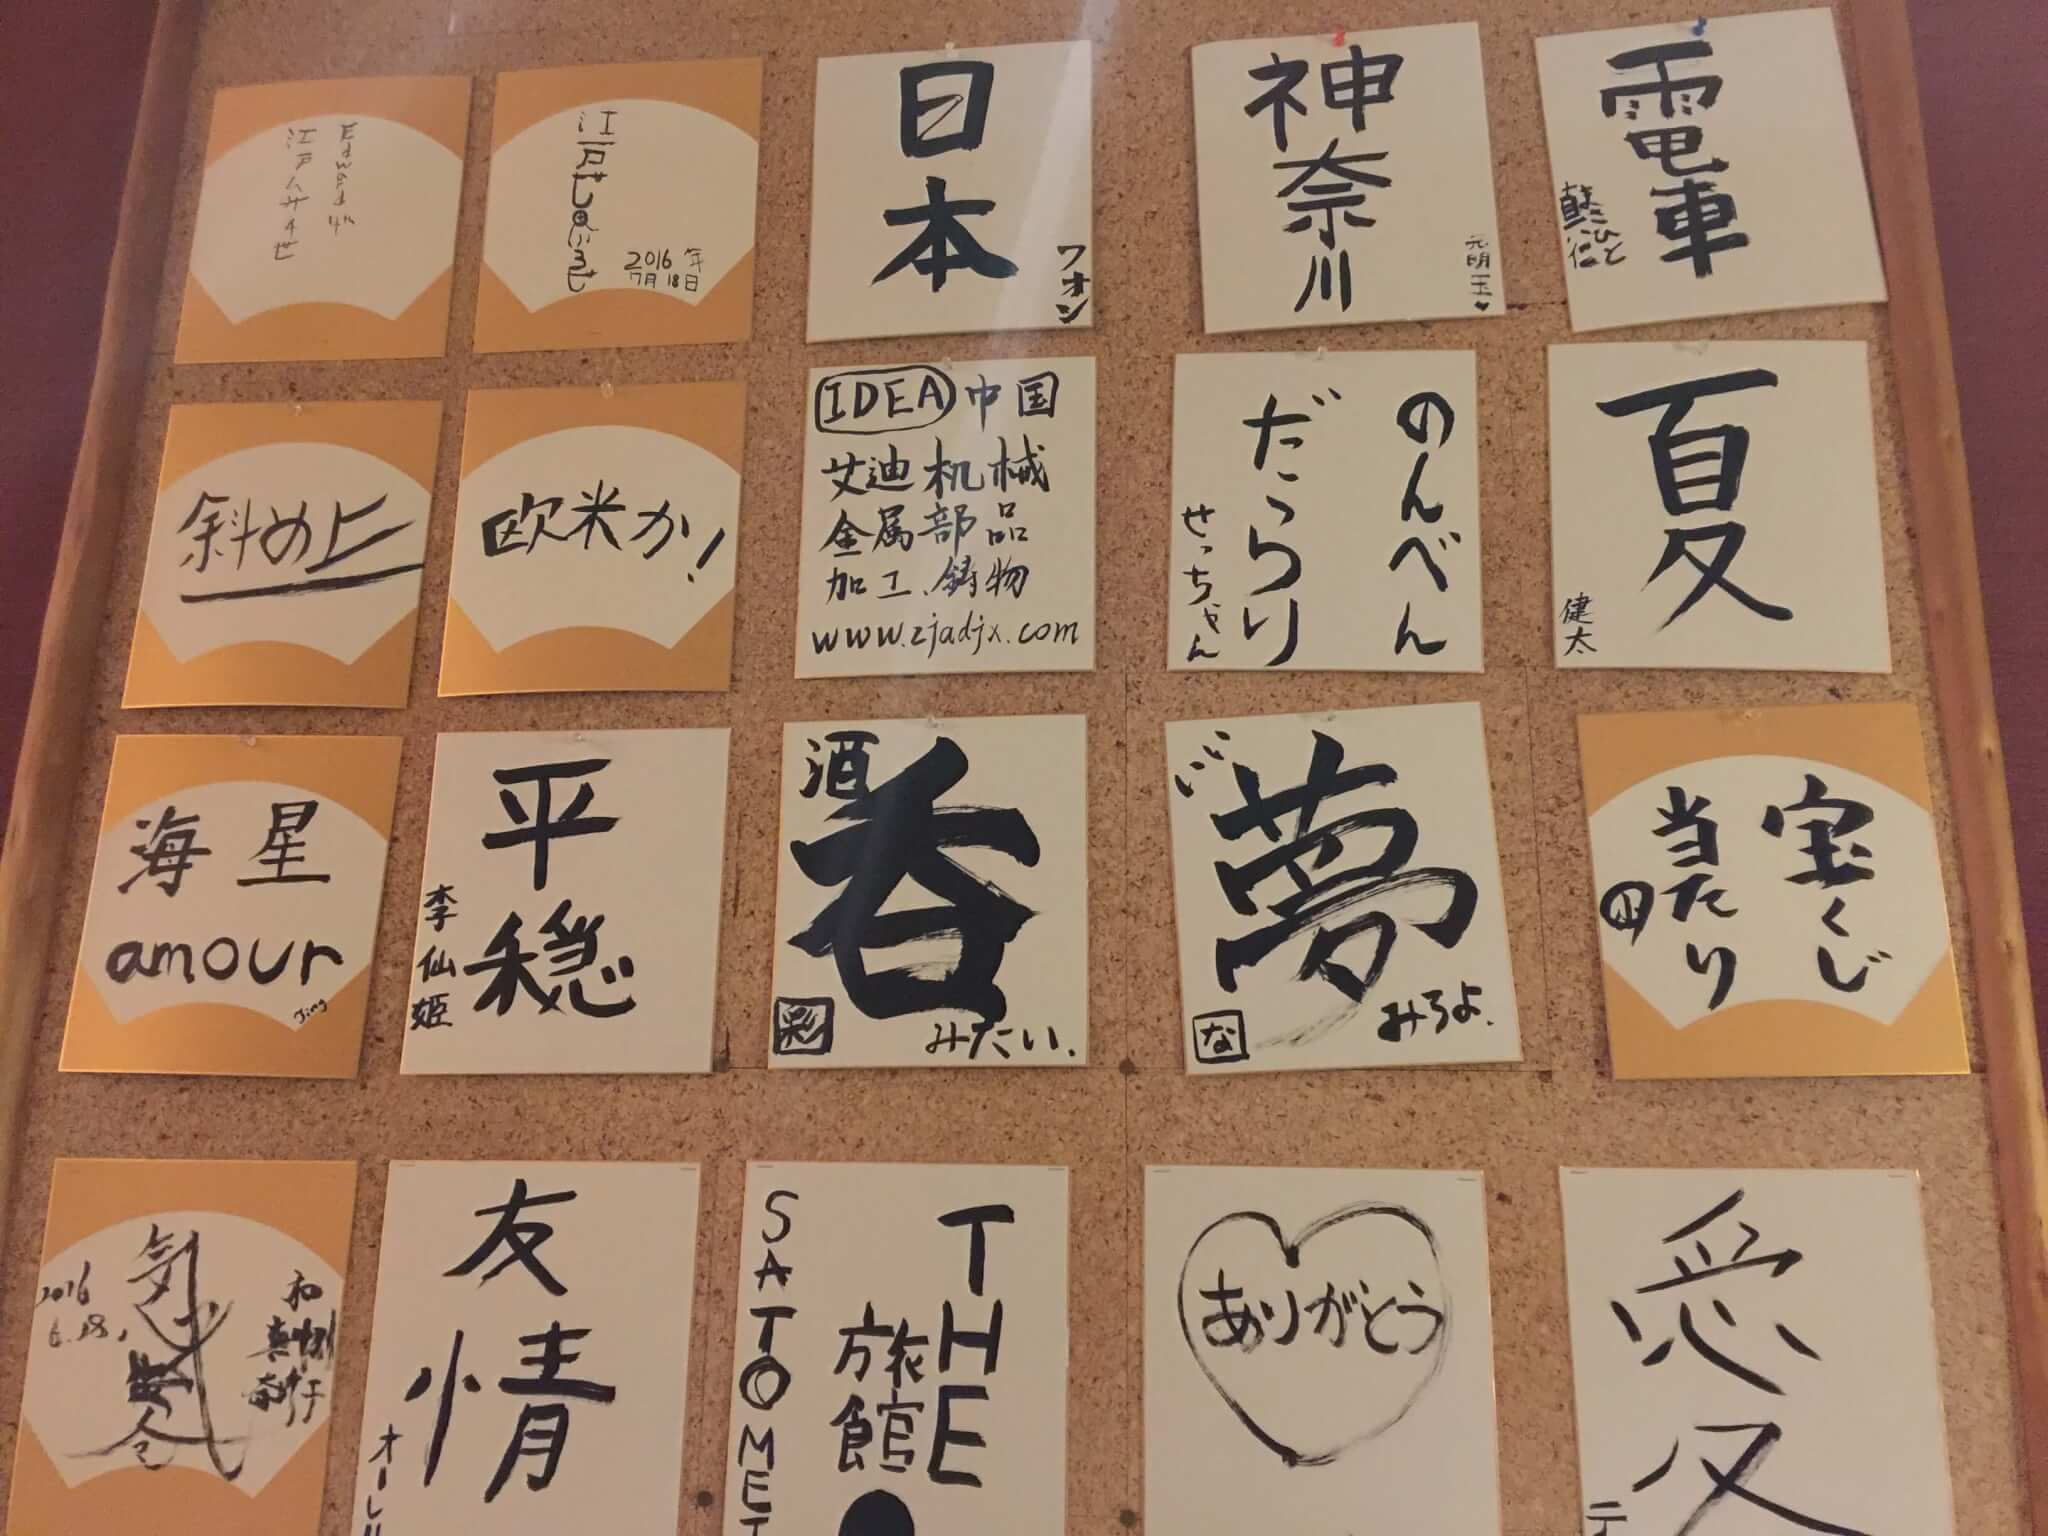 THE RYOKAN TOKYOの書道